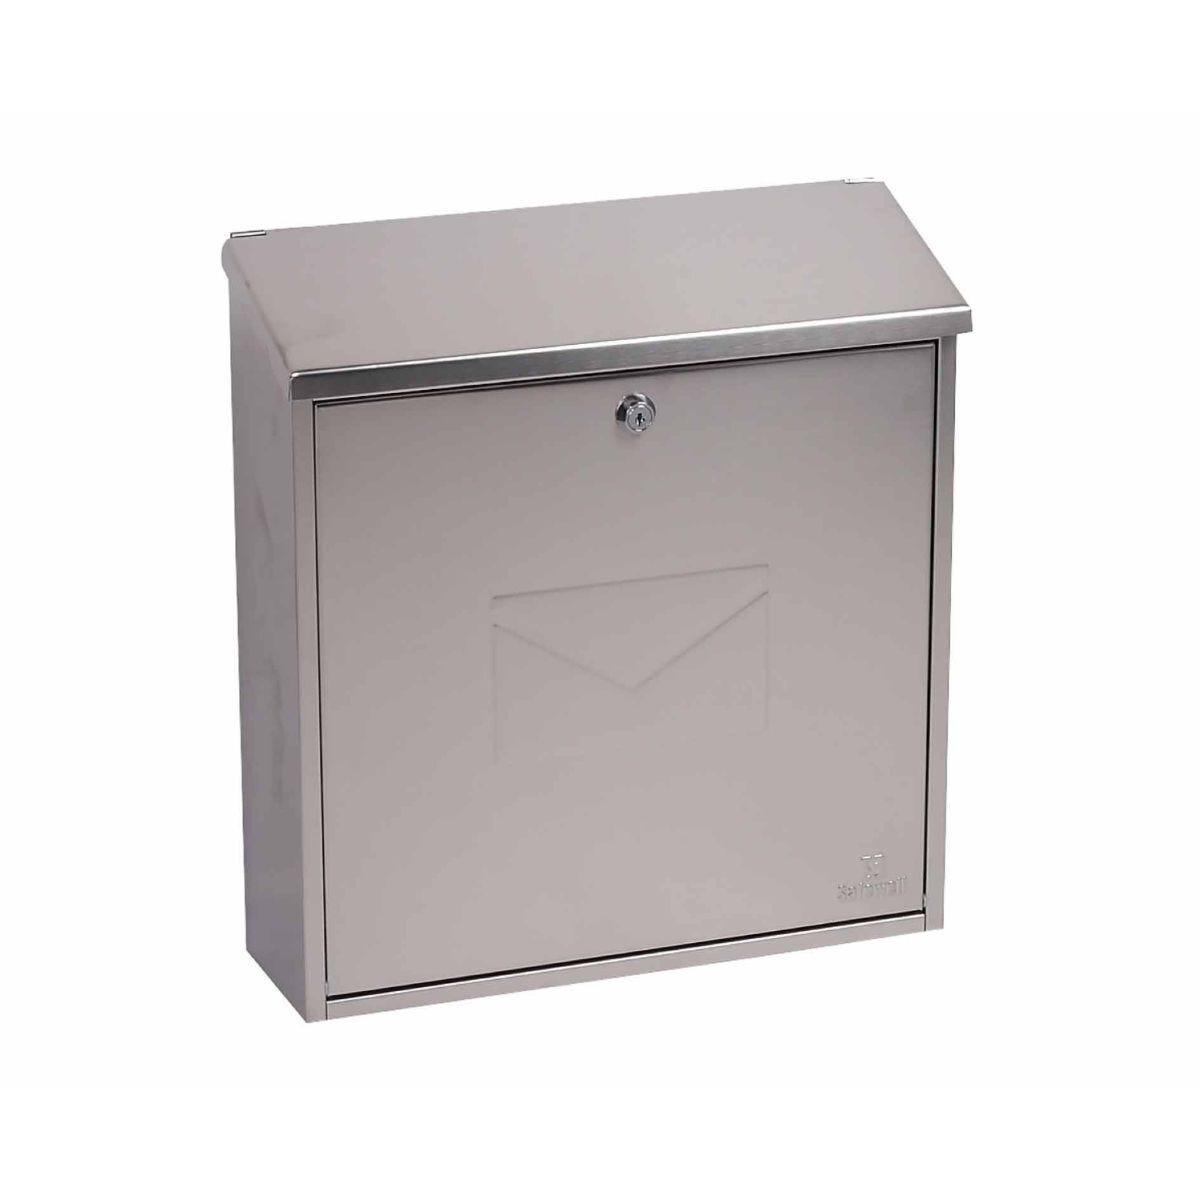 Phoenix Correo MB0118KS Top Loading Mailbox Stainless Steel